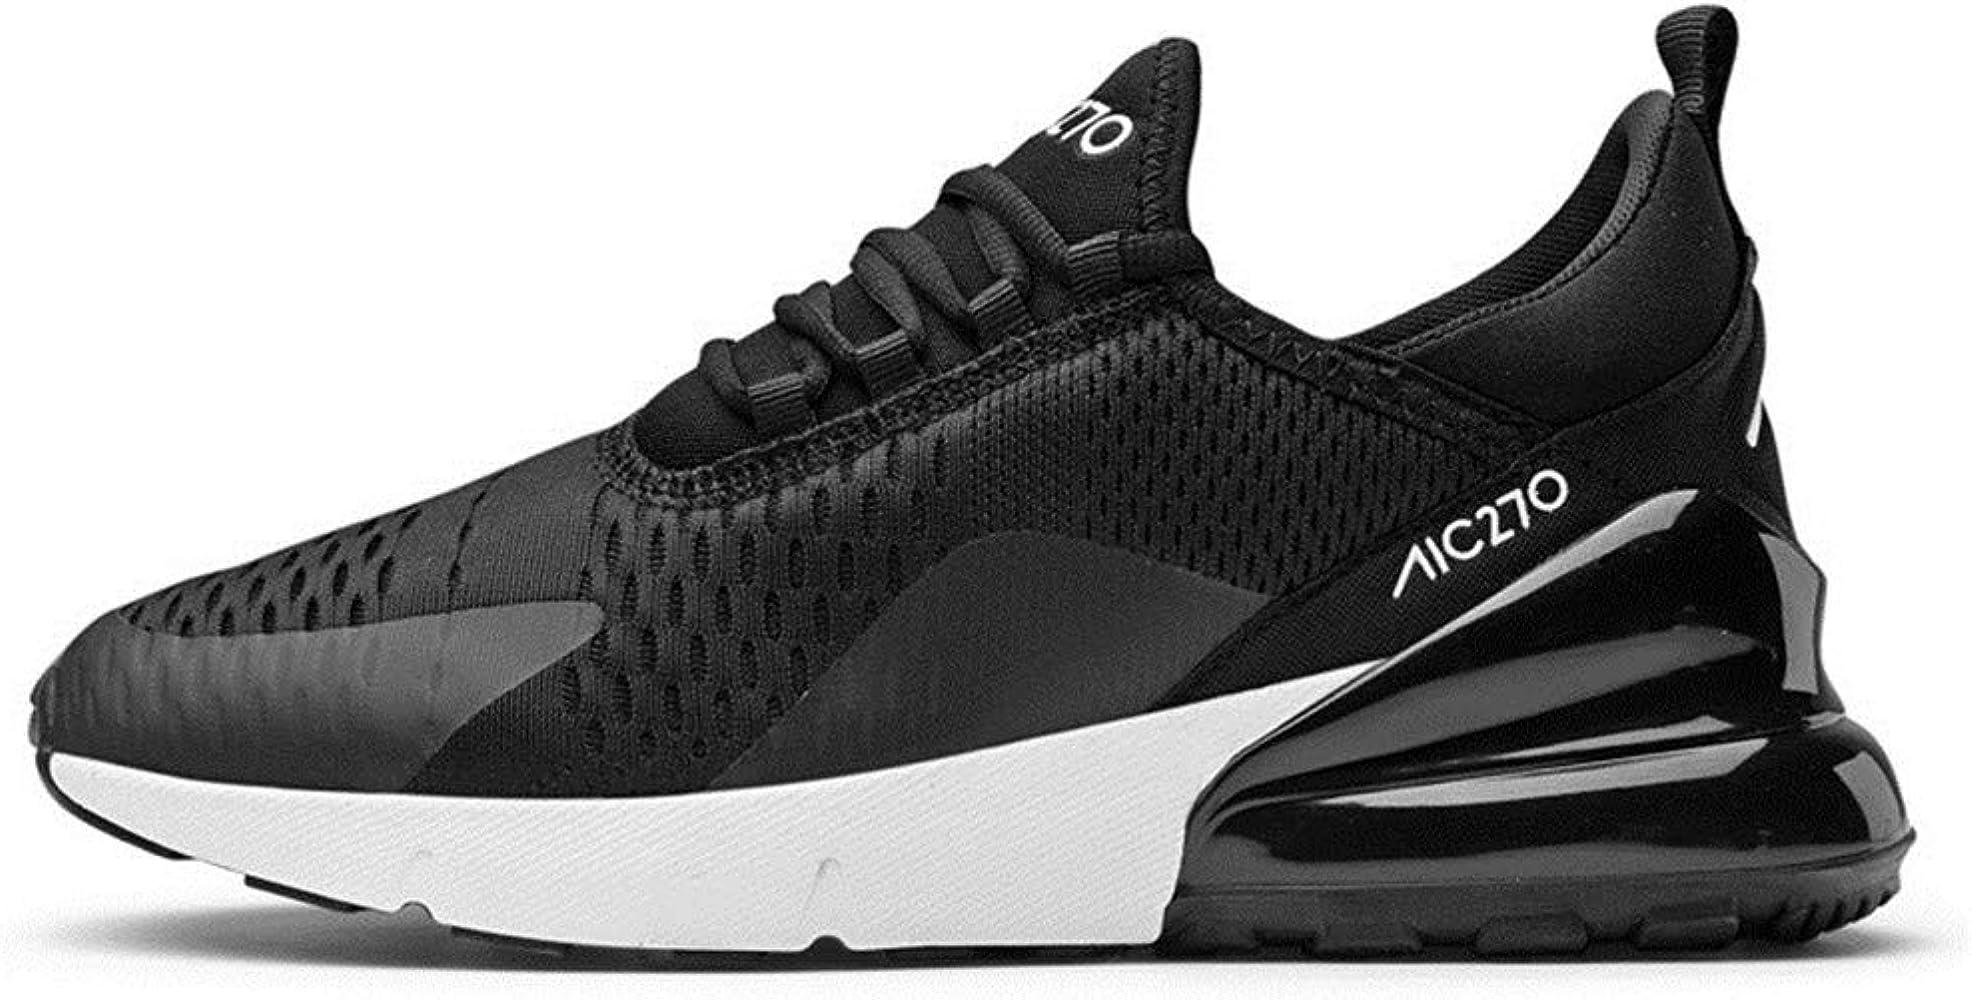 AZOOKEN Hombre Mujer Zapatillas de Deporte Zapatos Deportivos Aire Libre y Deportes Zapatillas de Running Gimnasia